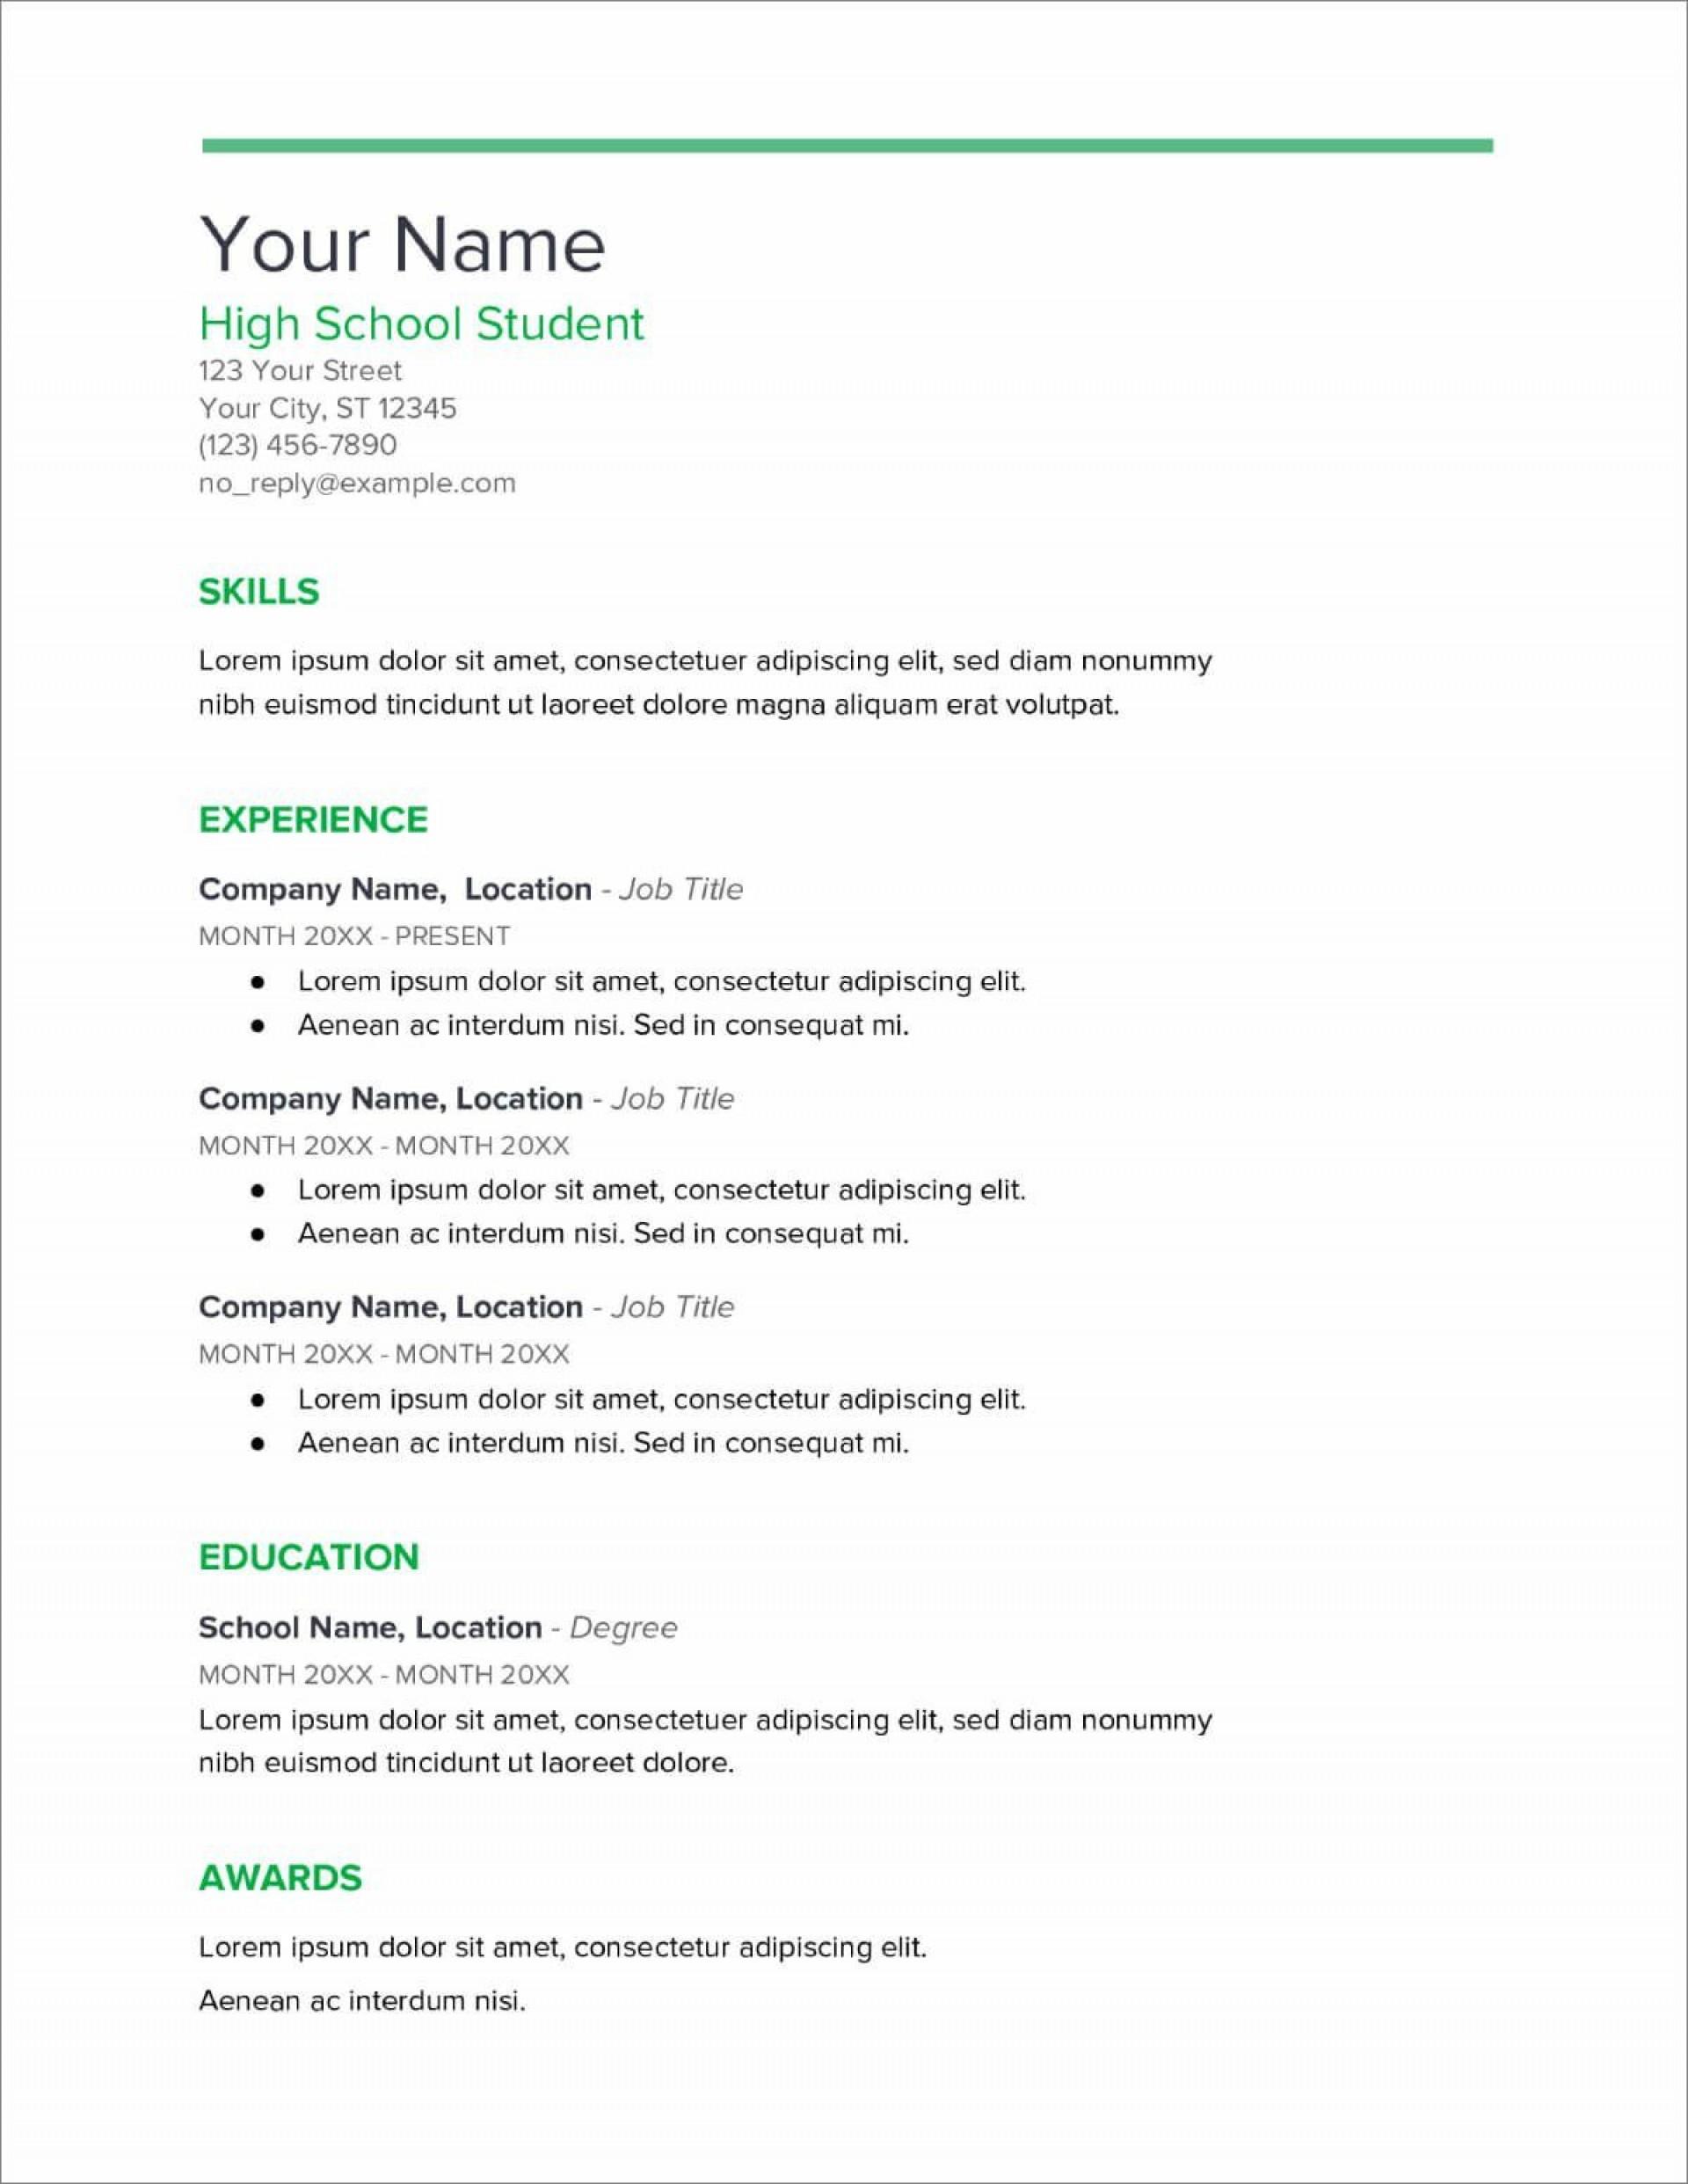 005 Stupendou Resume Template High School Picture  Student Australia For Google Doc Graduate Microsoft Word1920